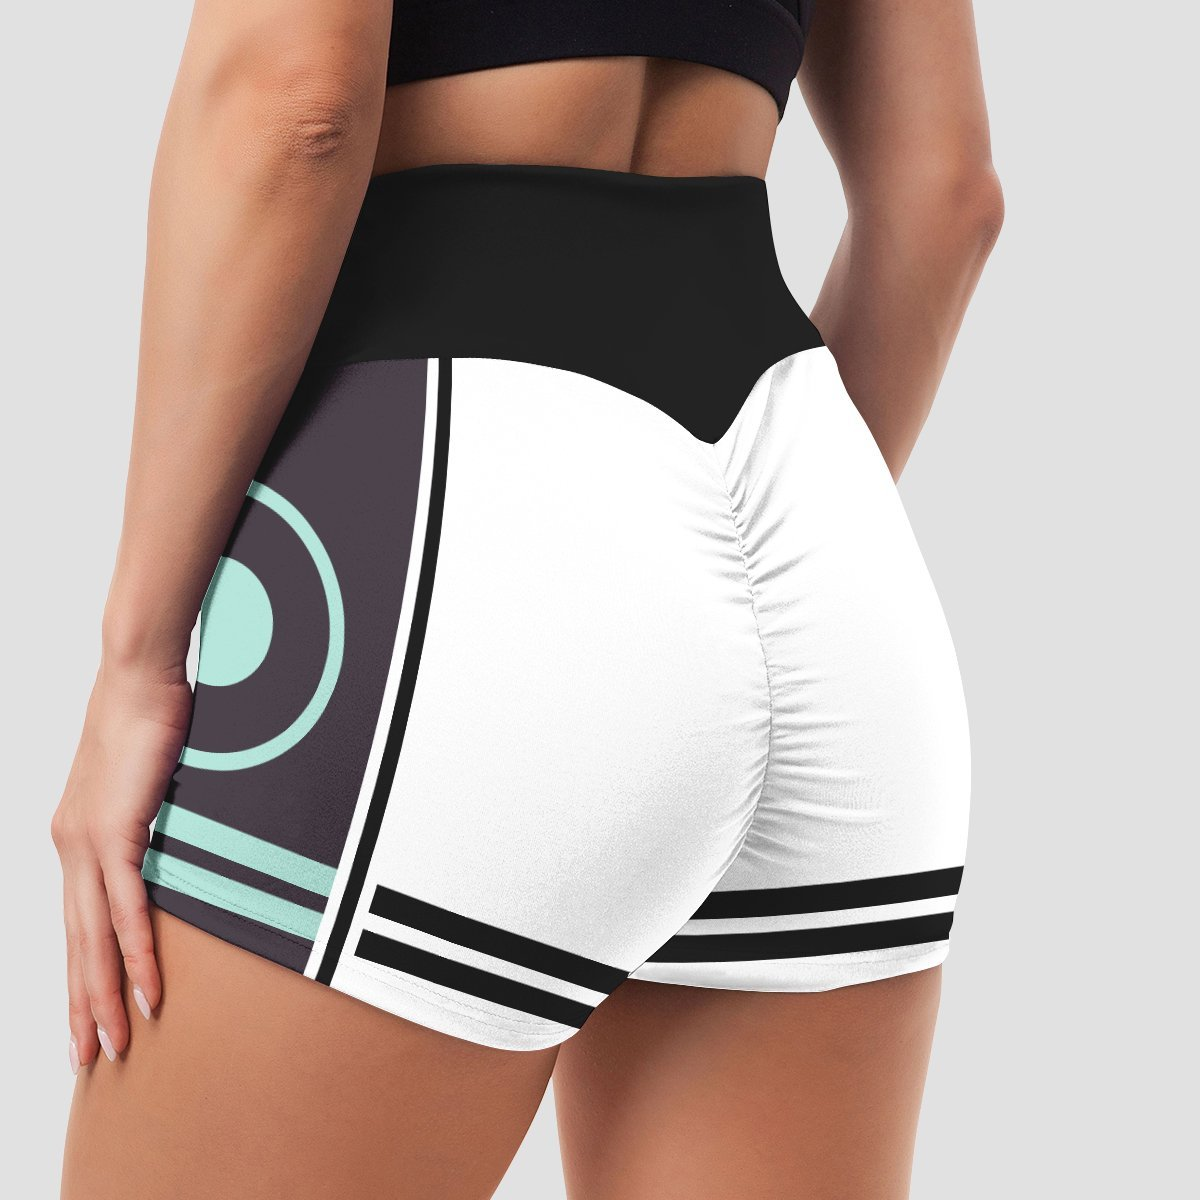 legend sukuna active wear set 574007 - Anime Swimsuits